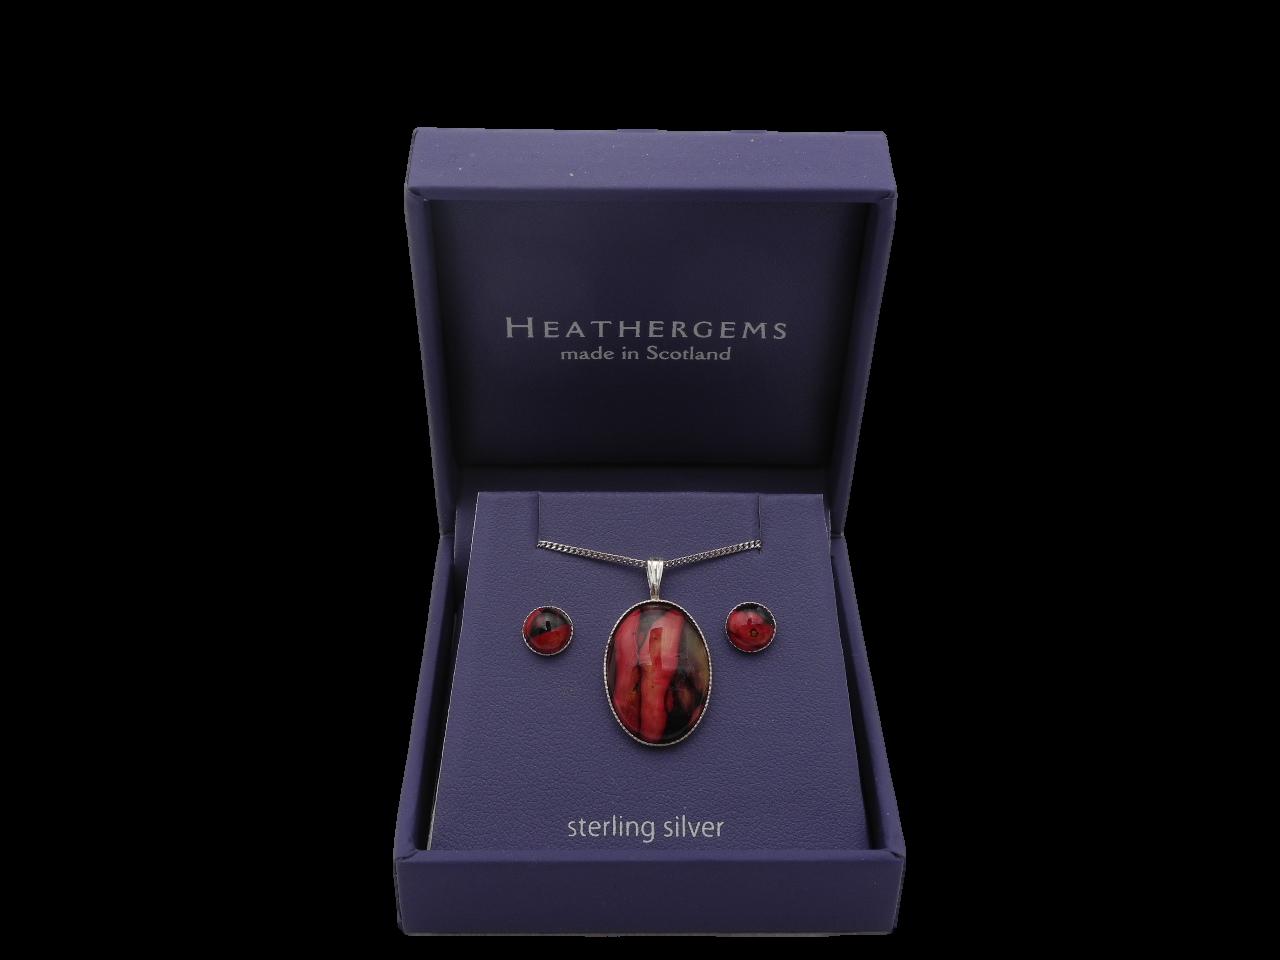 scottish ladies gift pendant necklace earrings heathergem